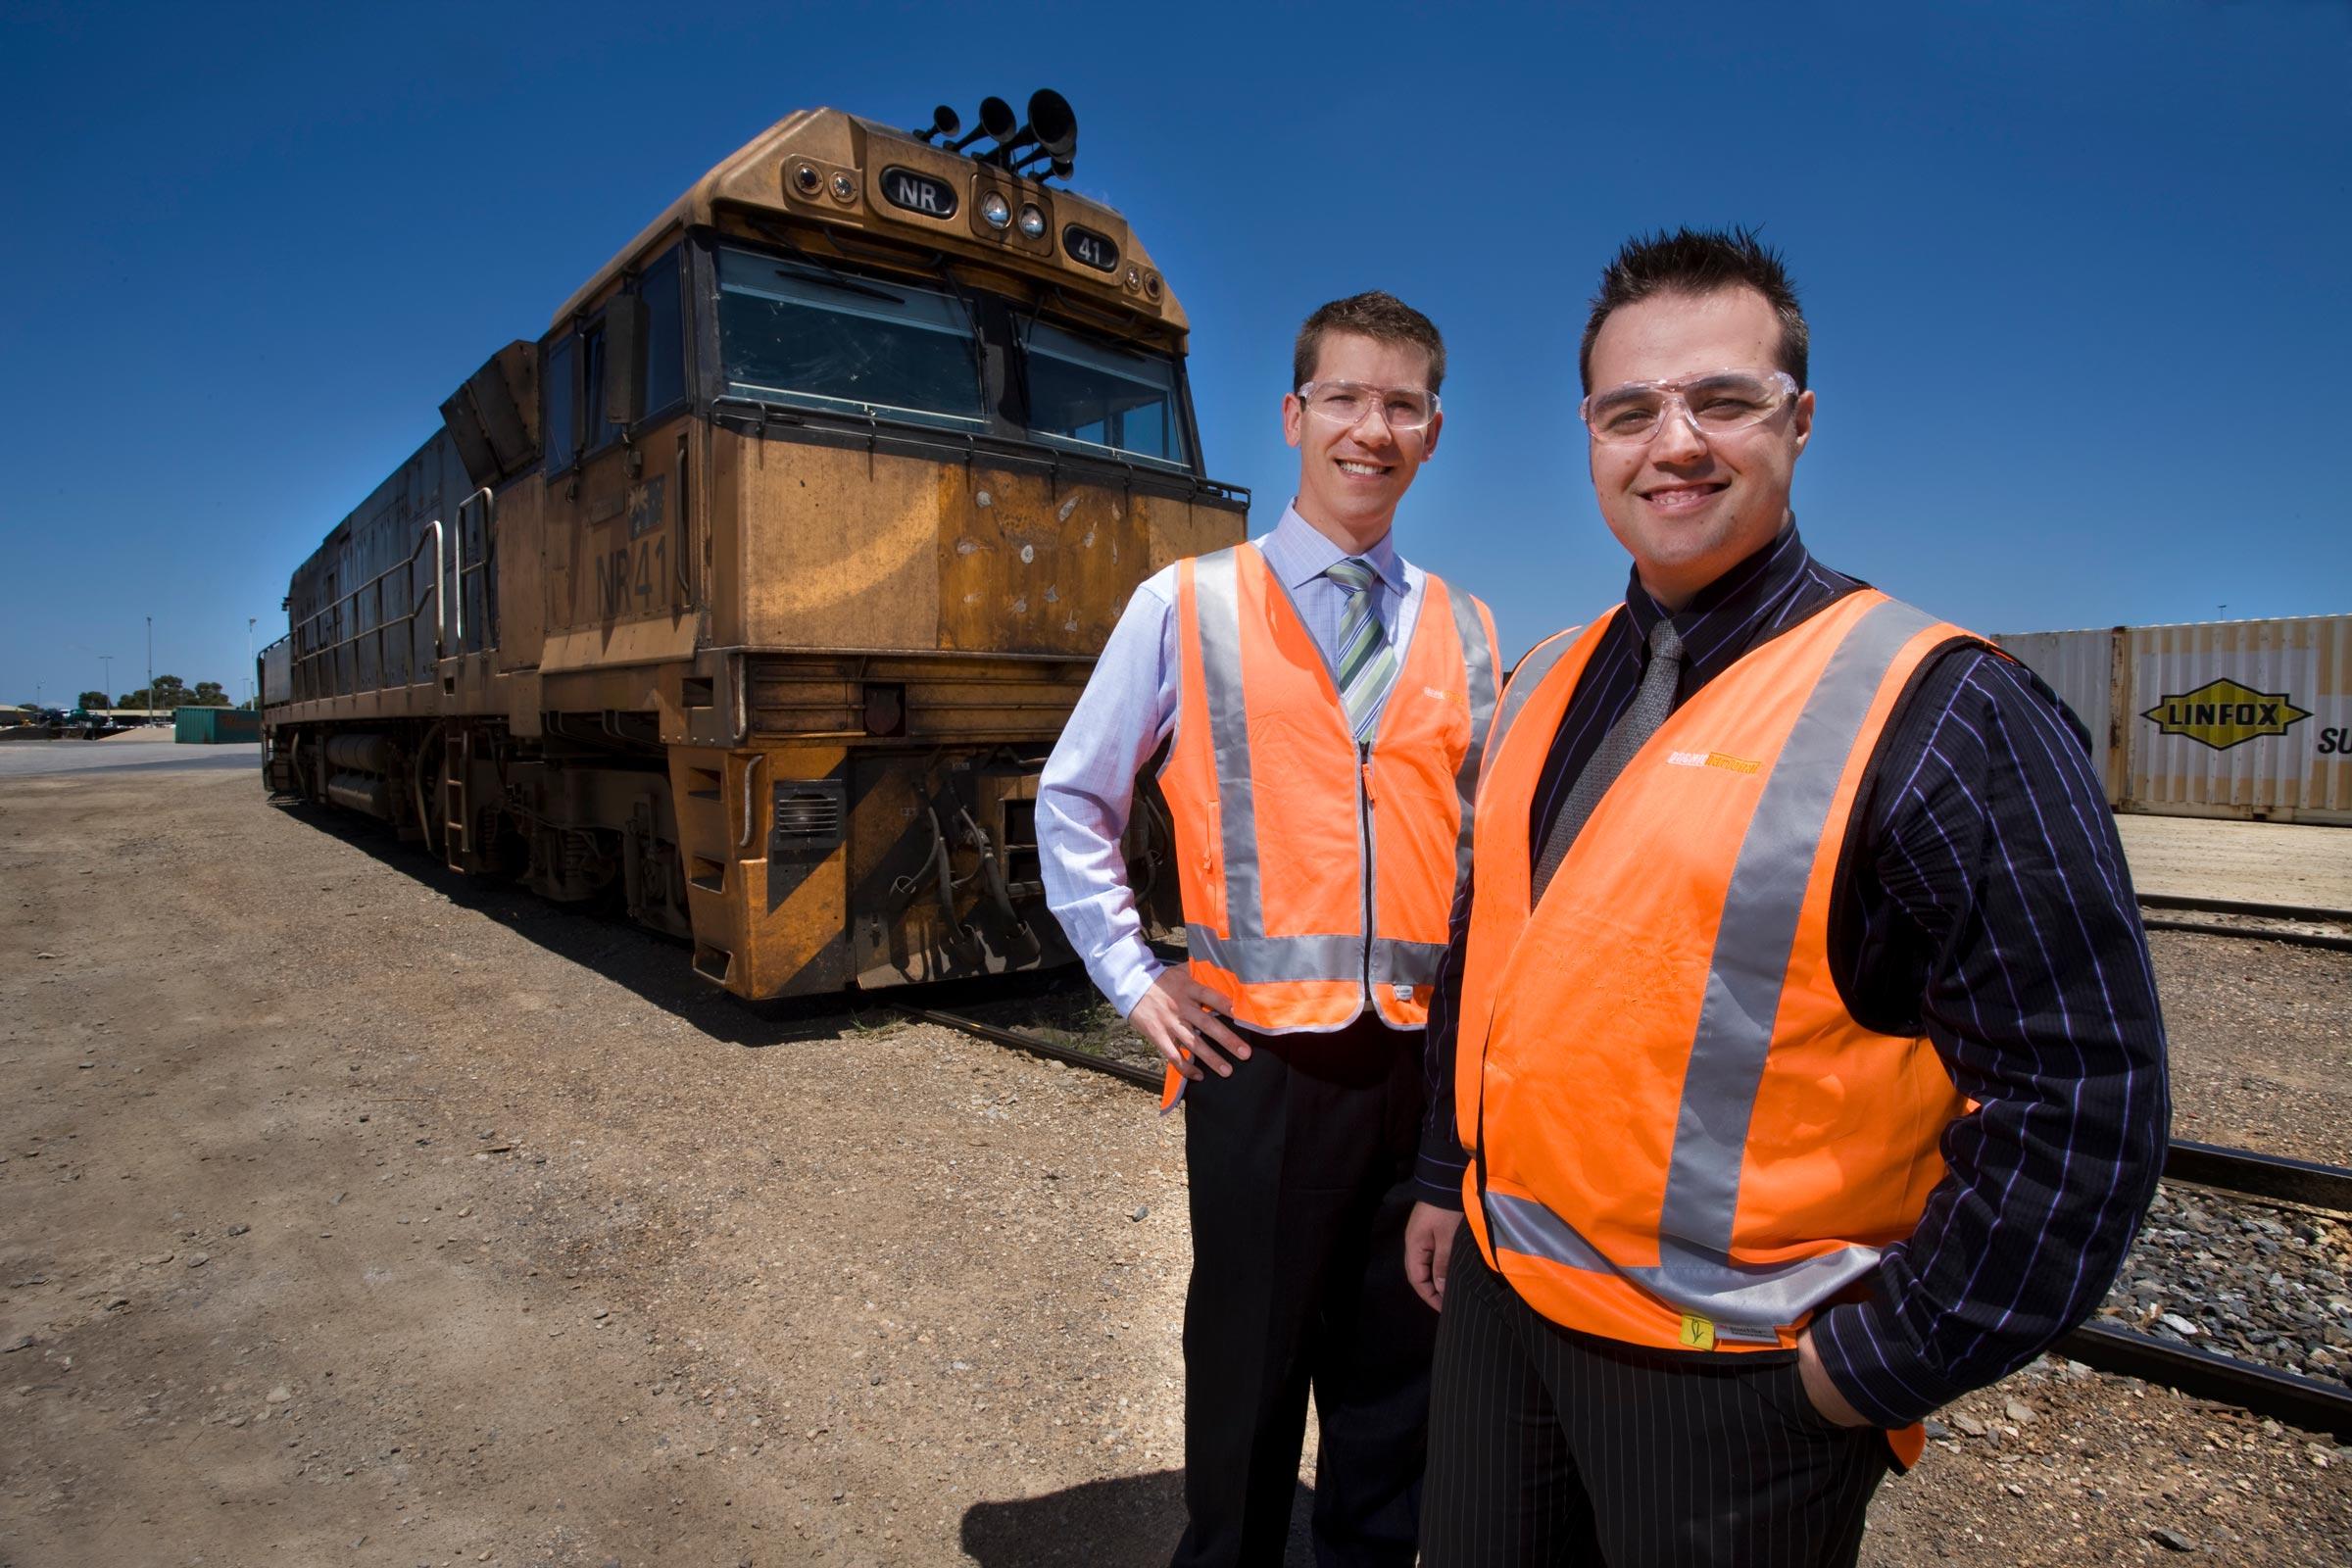 2 men wearing vests standing beside a freight train